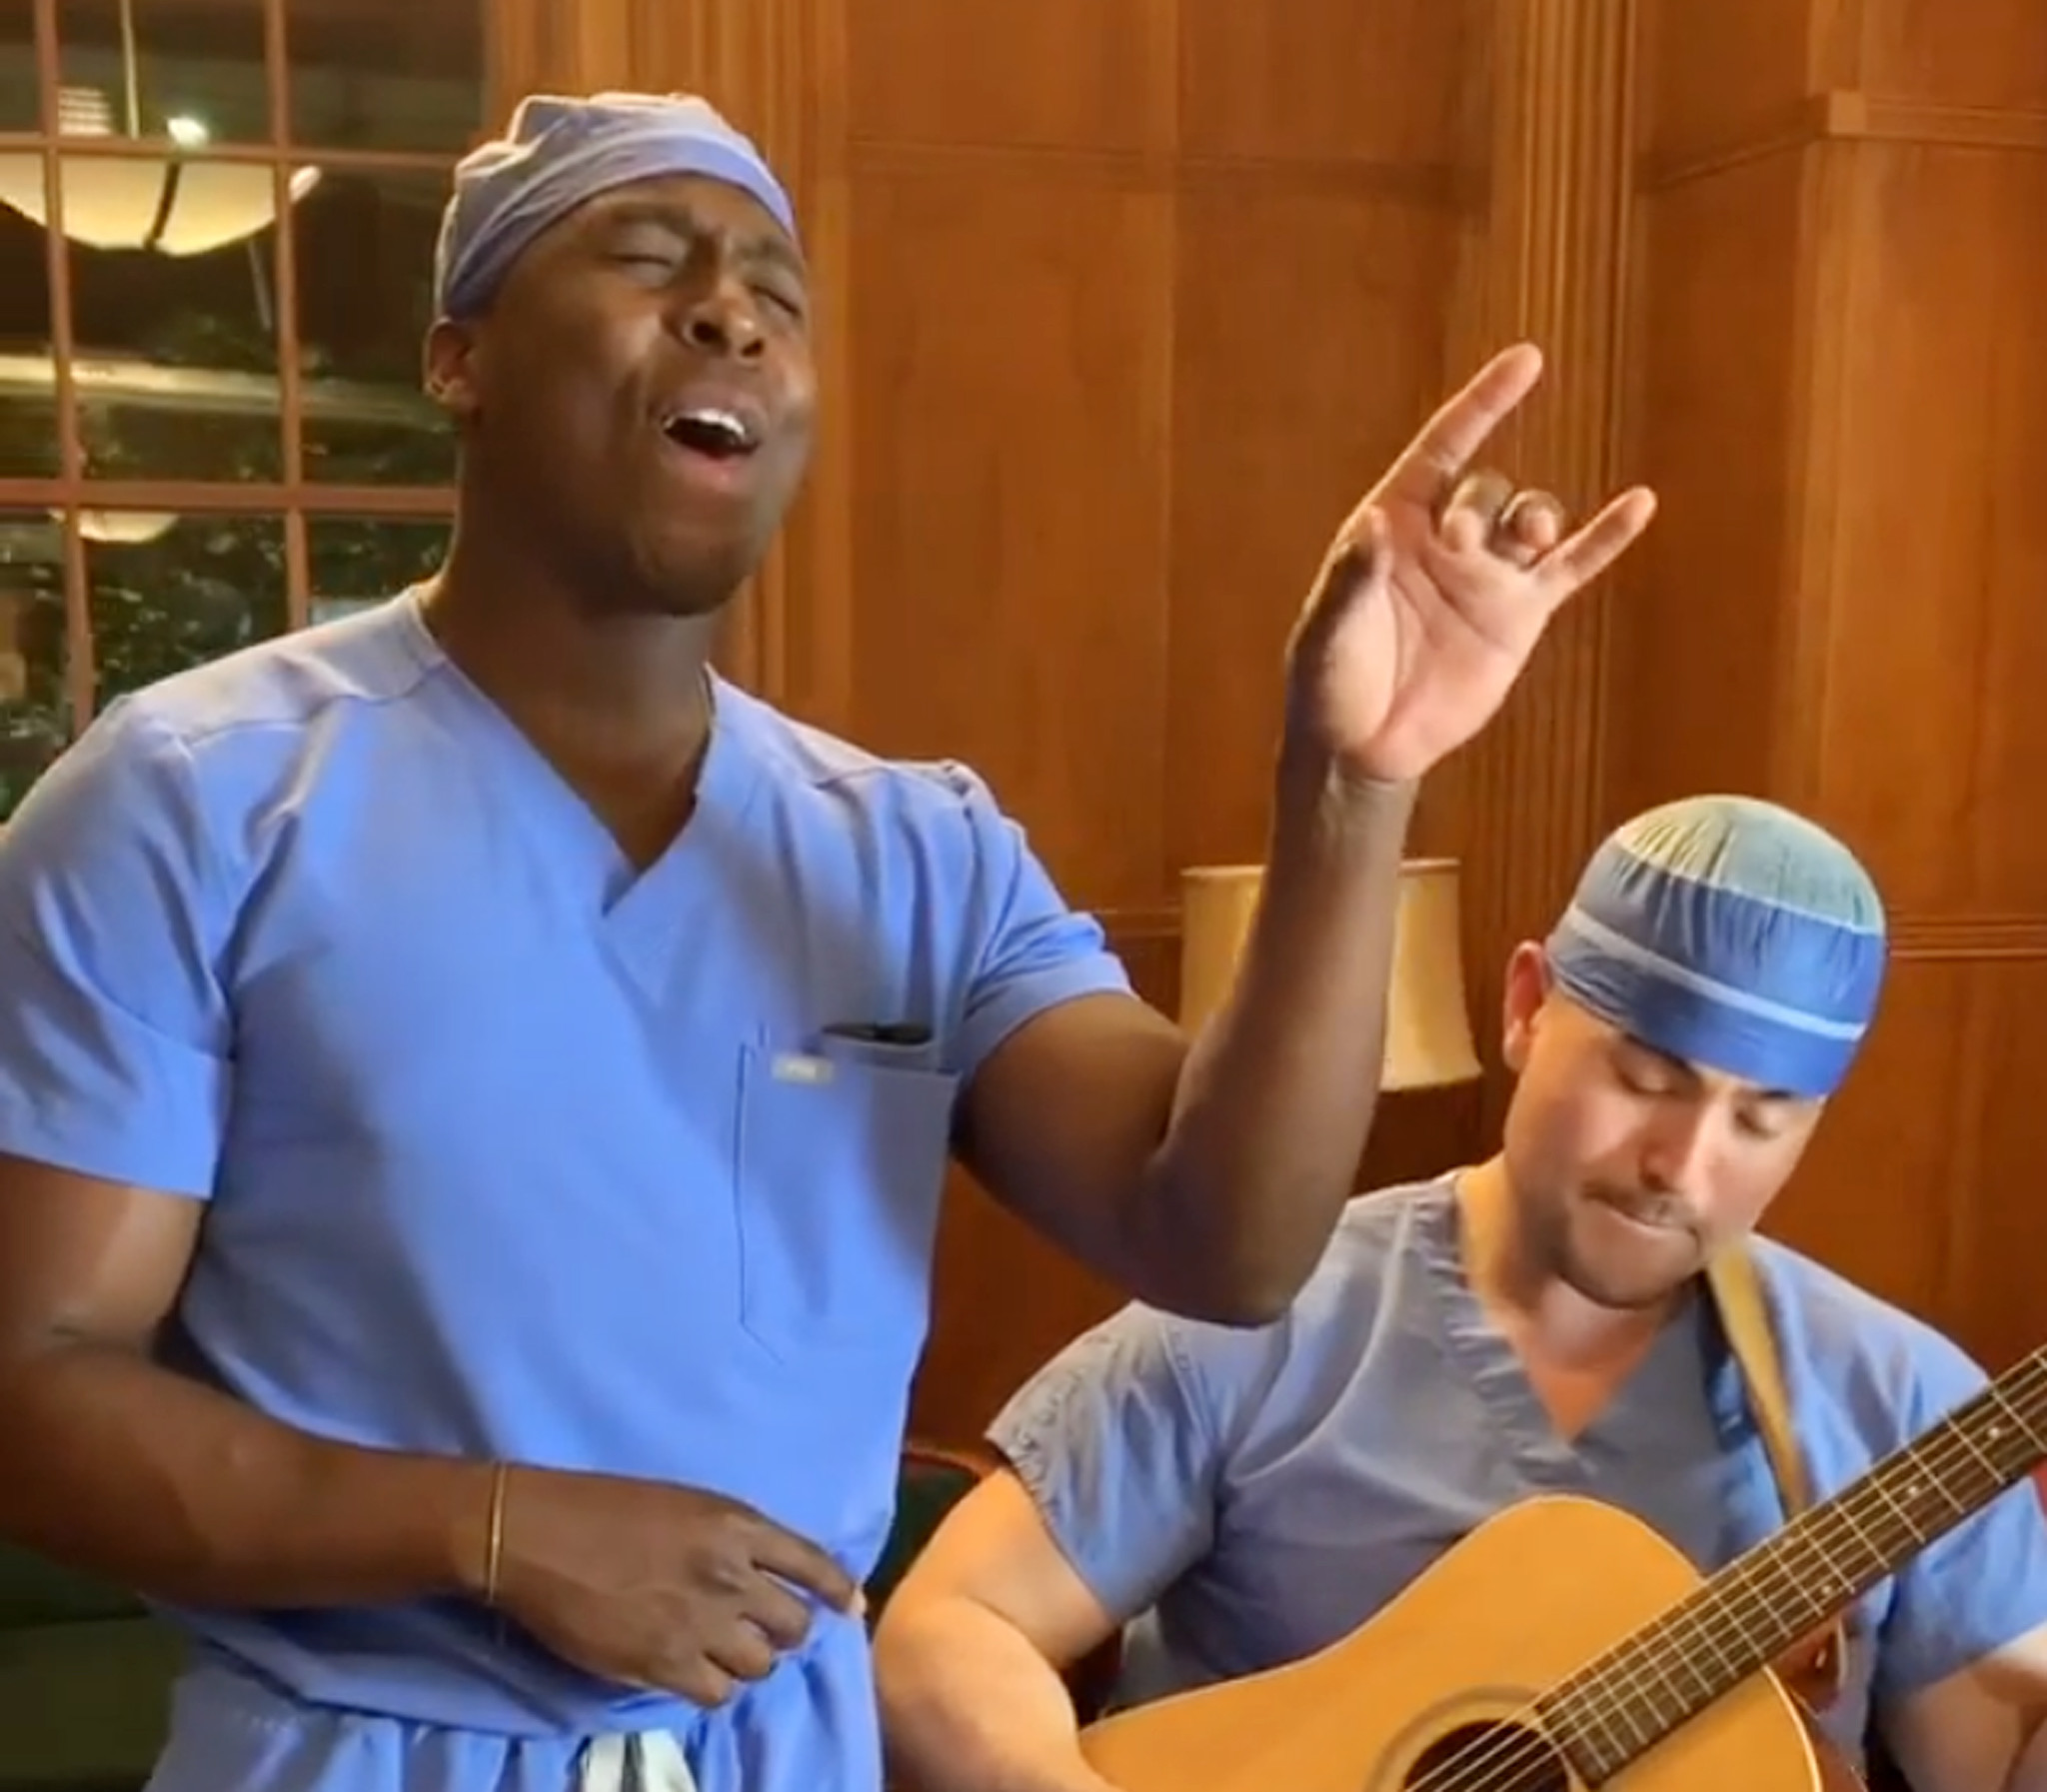 'Singing Surgeon' Elvis Francois goes viral during the coronavirus crisis